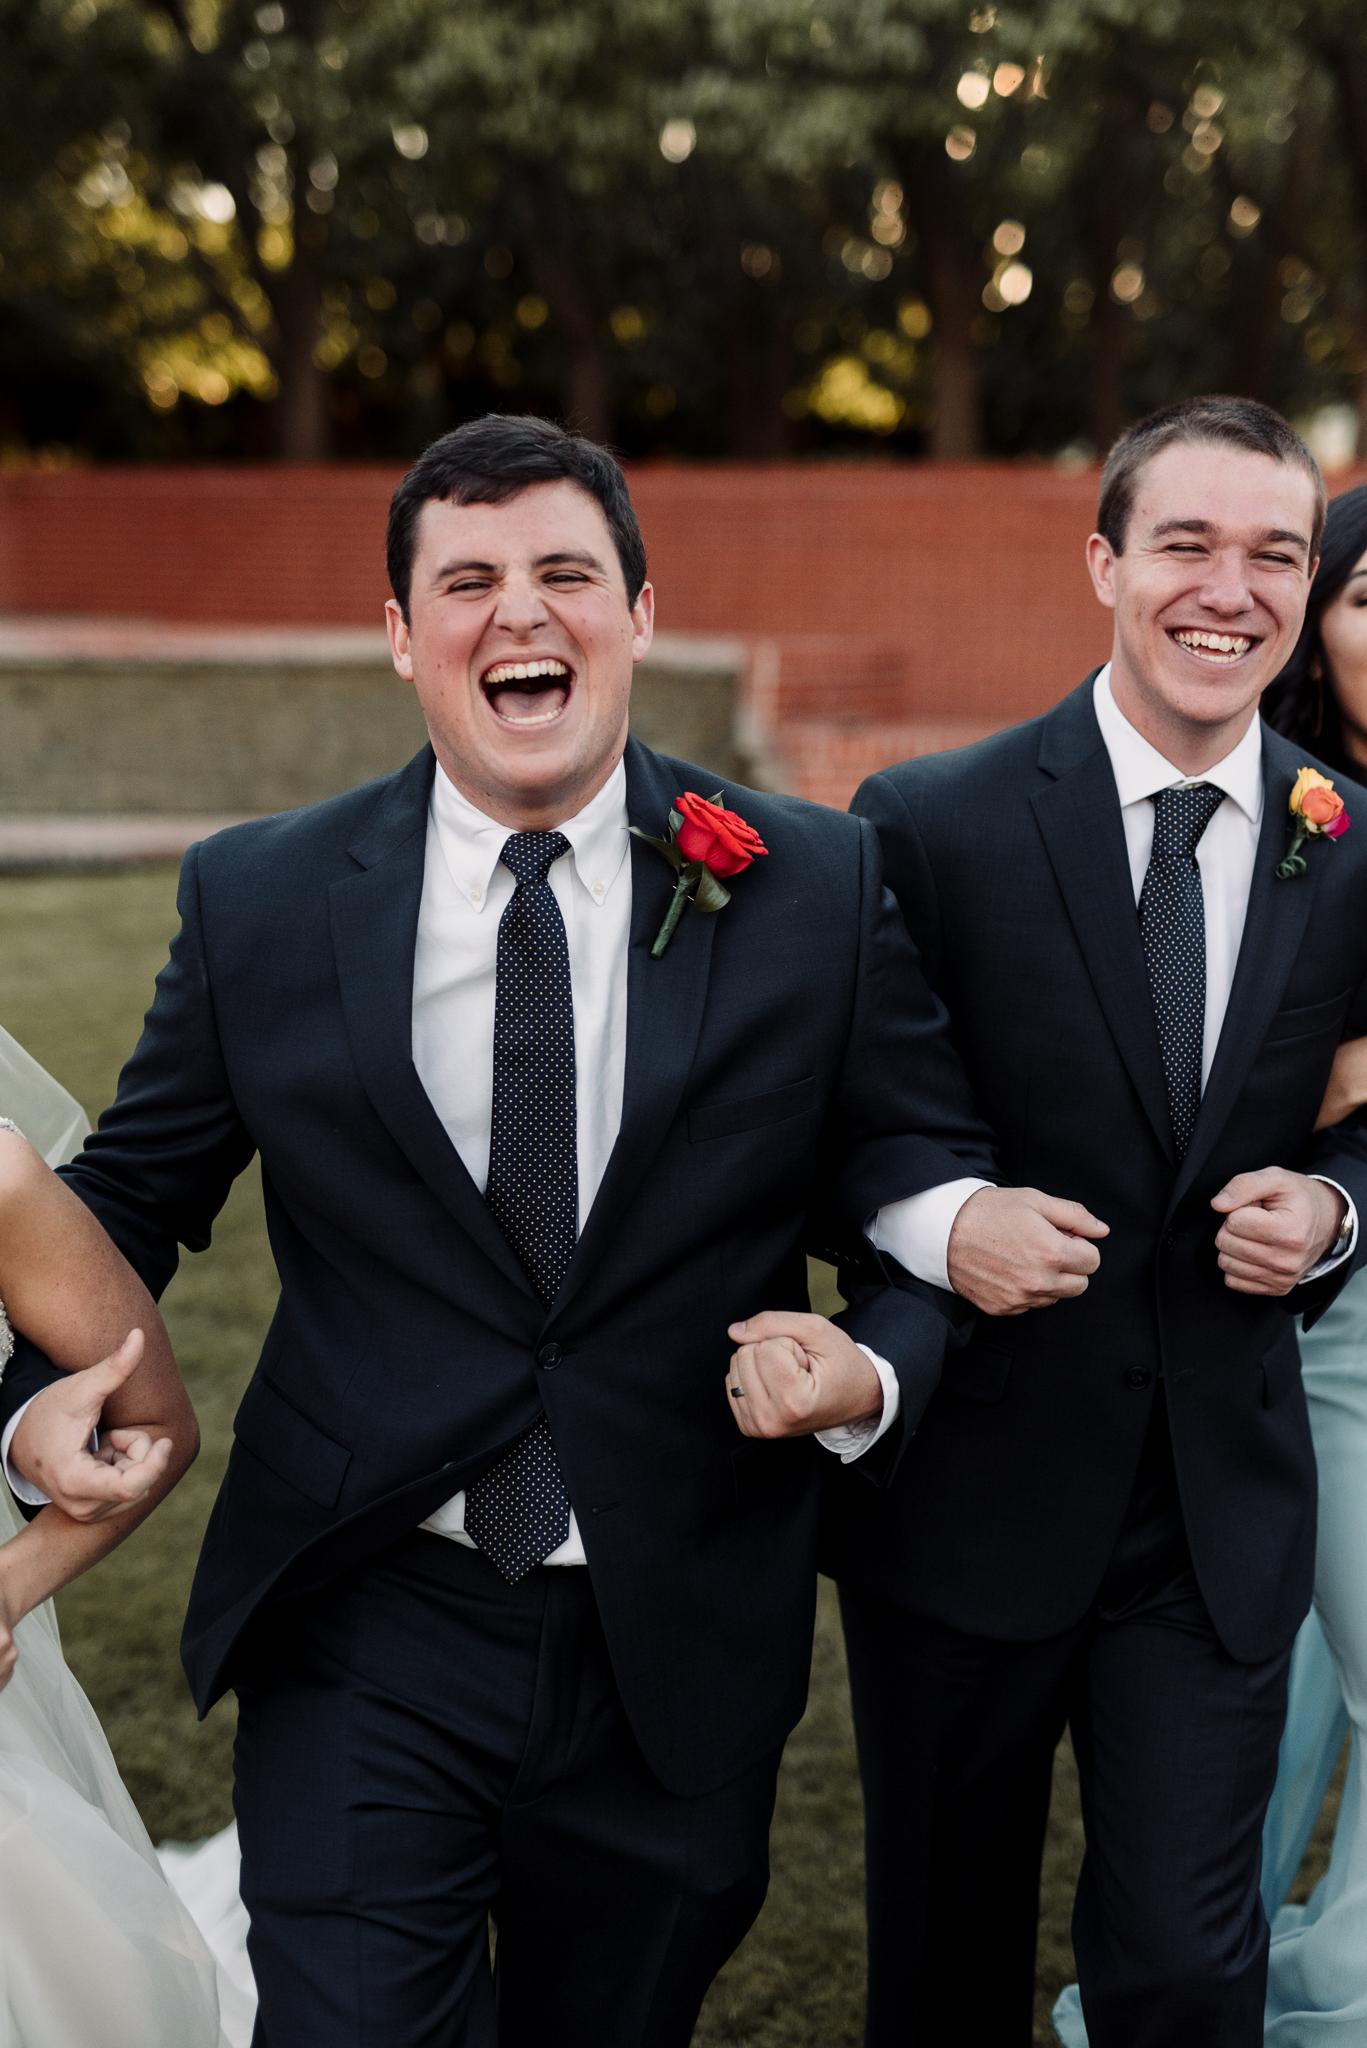 Oklahoma-Christian-University-Wedding-8556.jpg